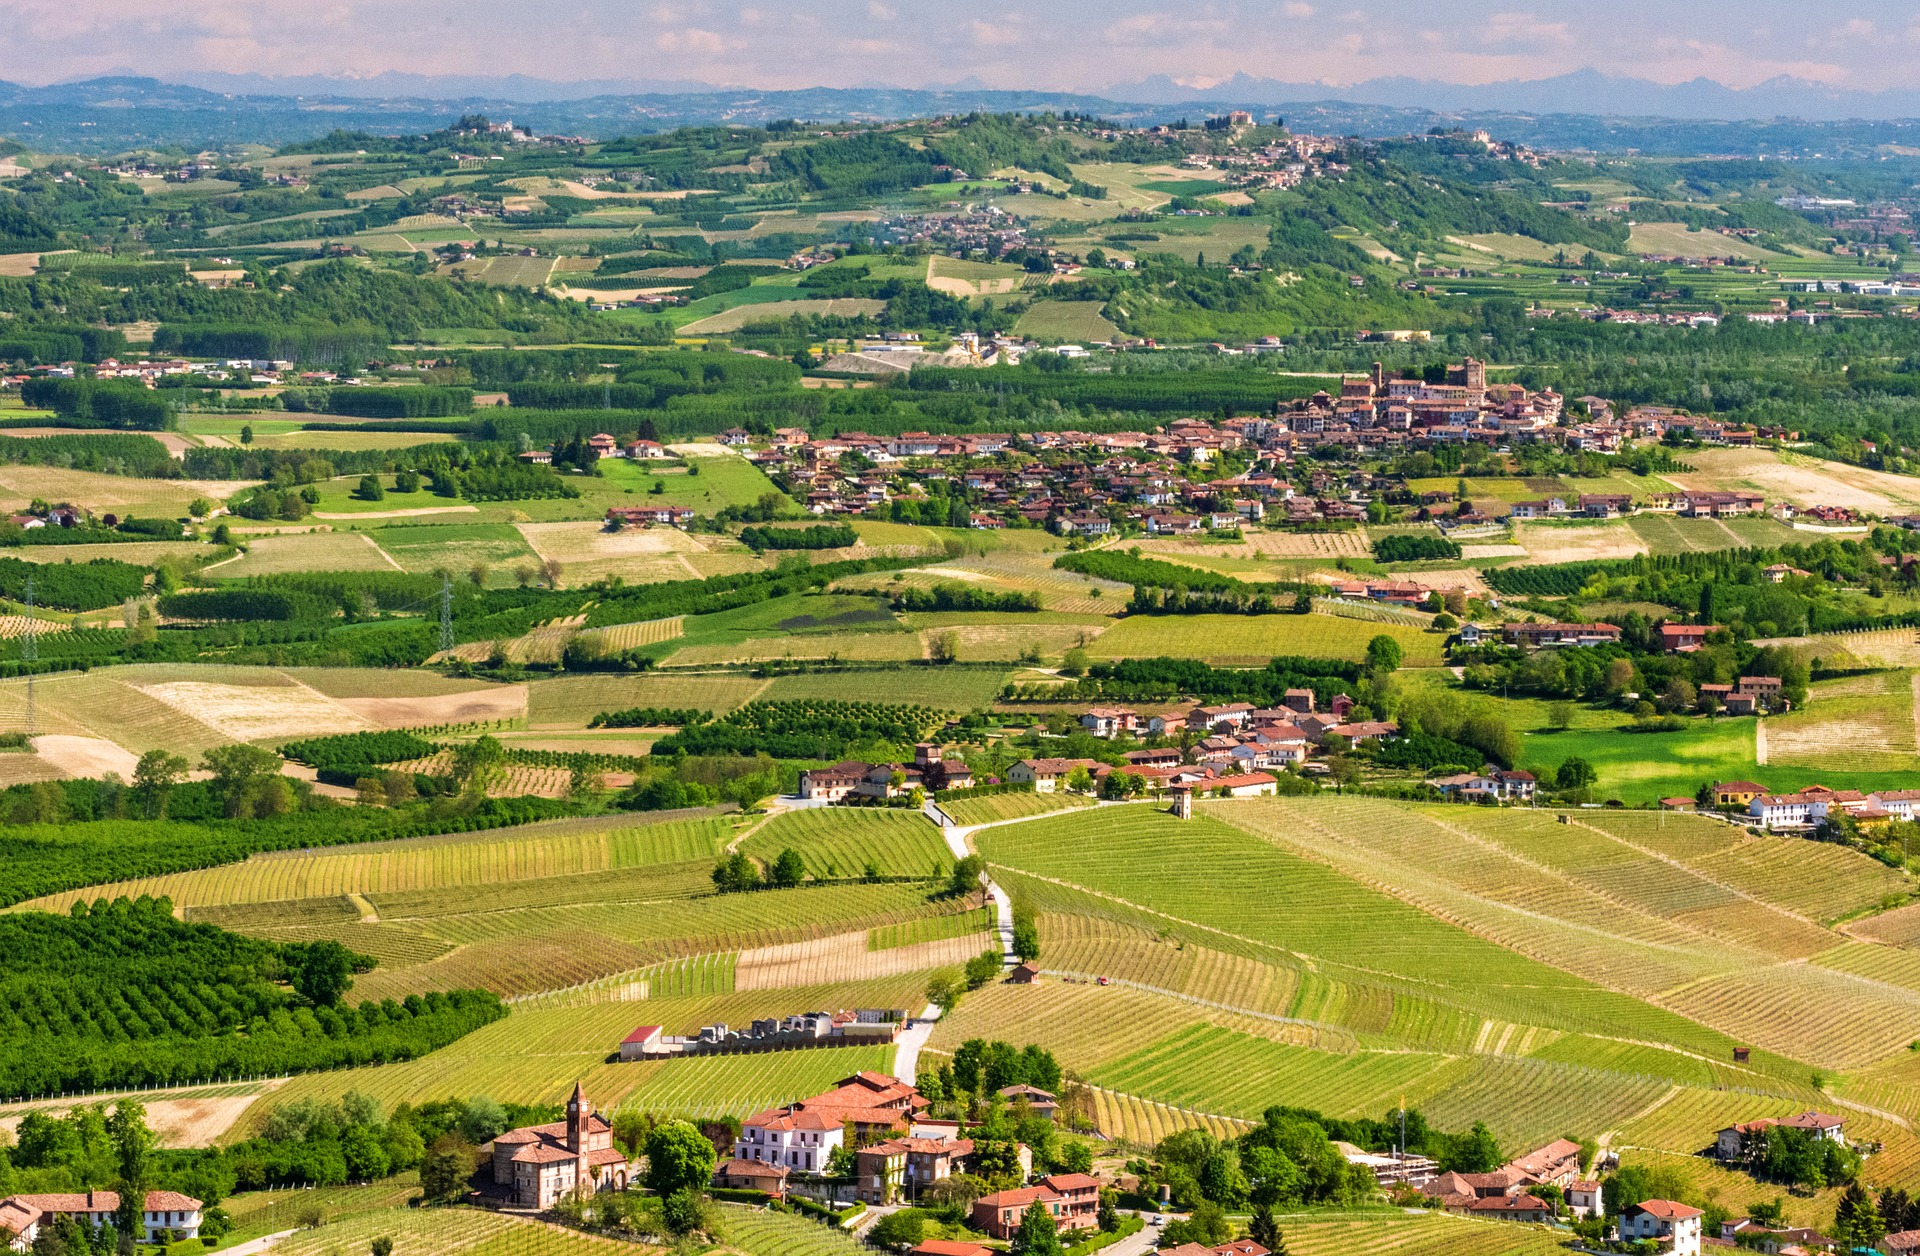 Piedmont: Food, Wine & Truffles - Langhe, italy